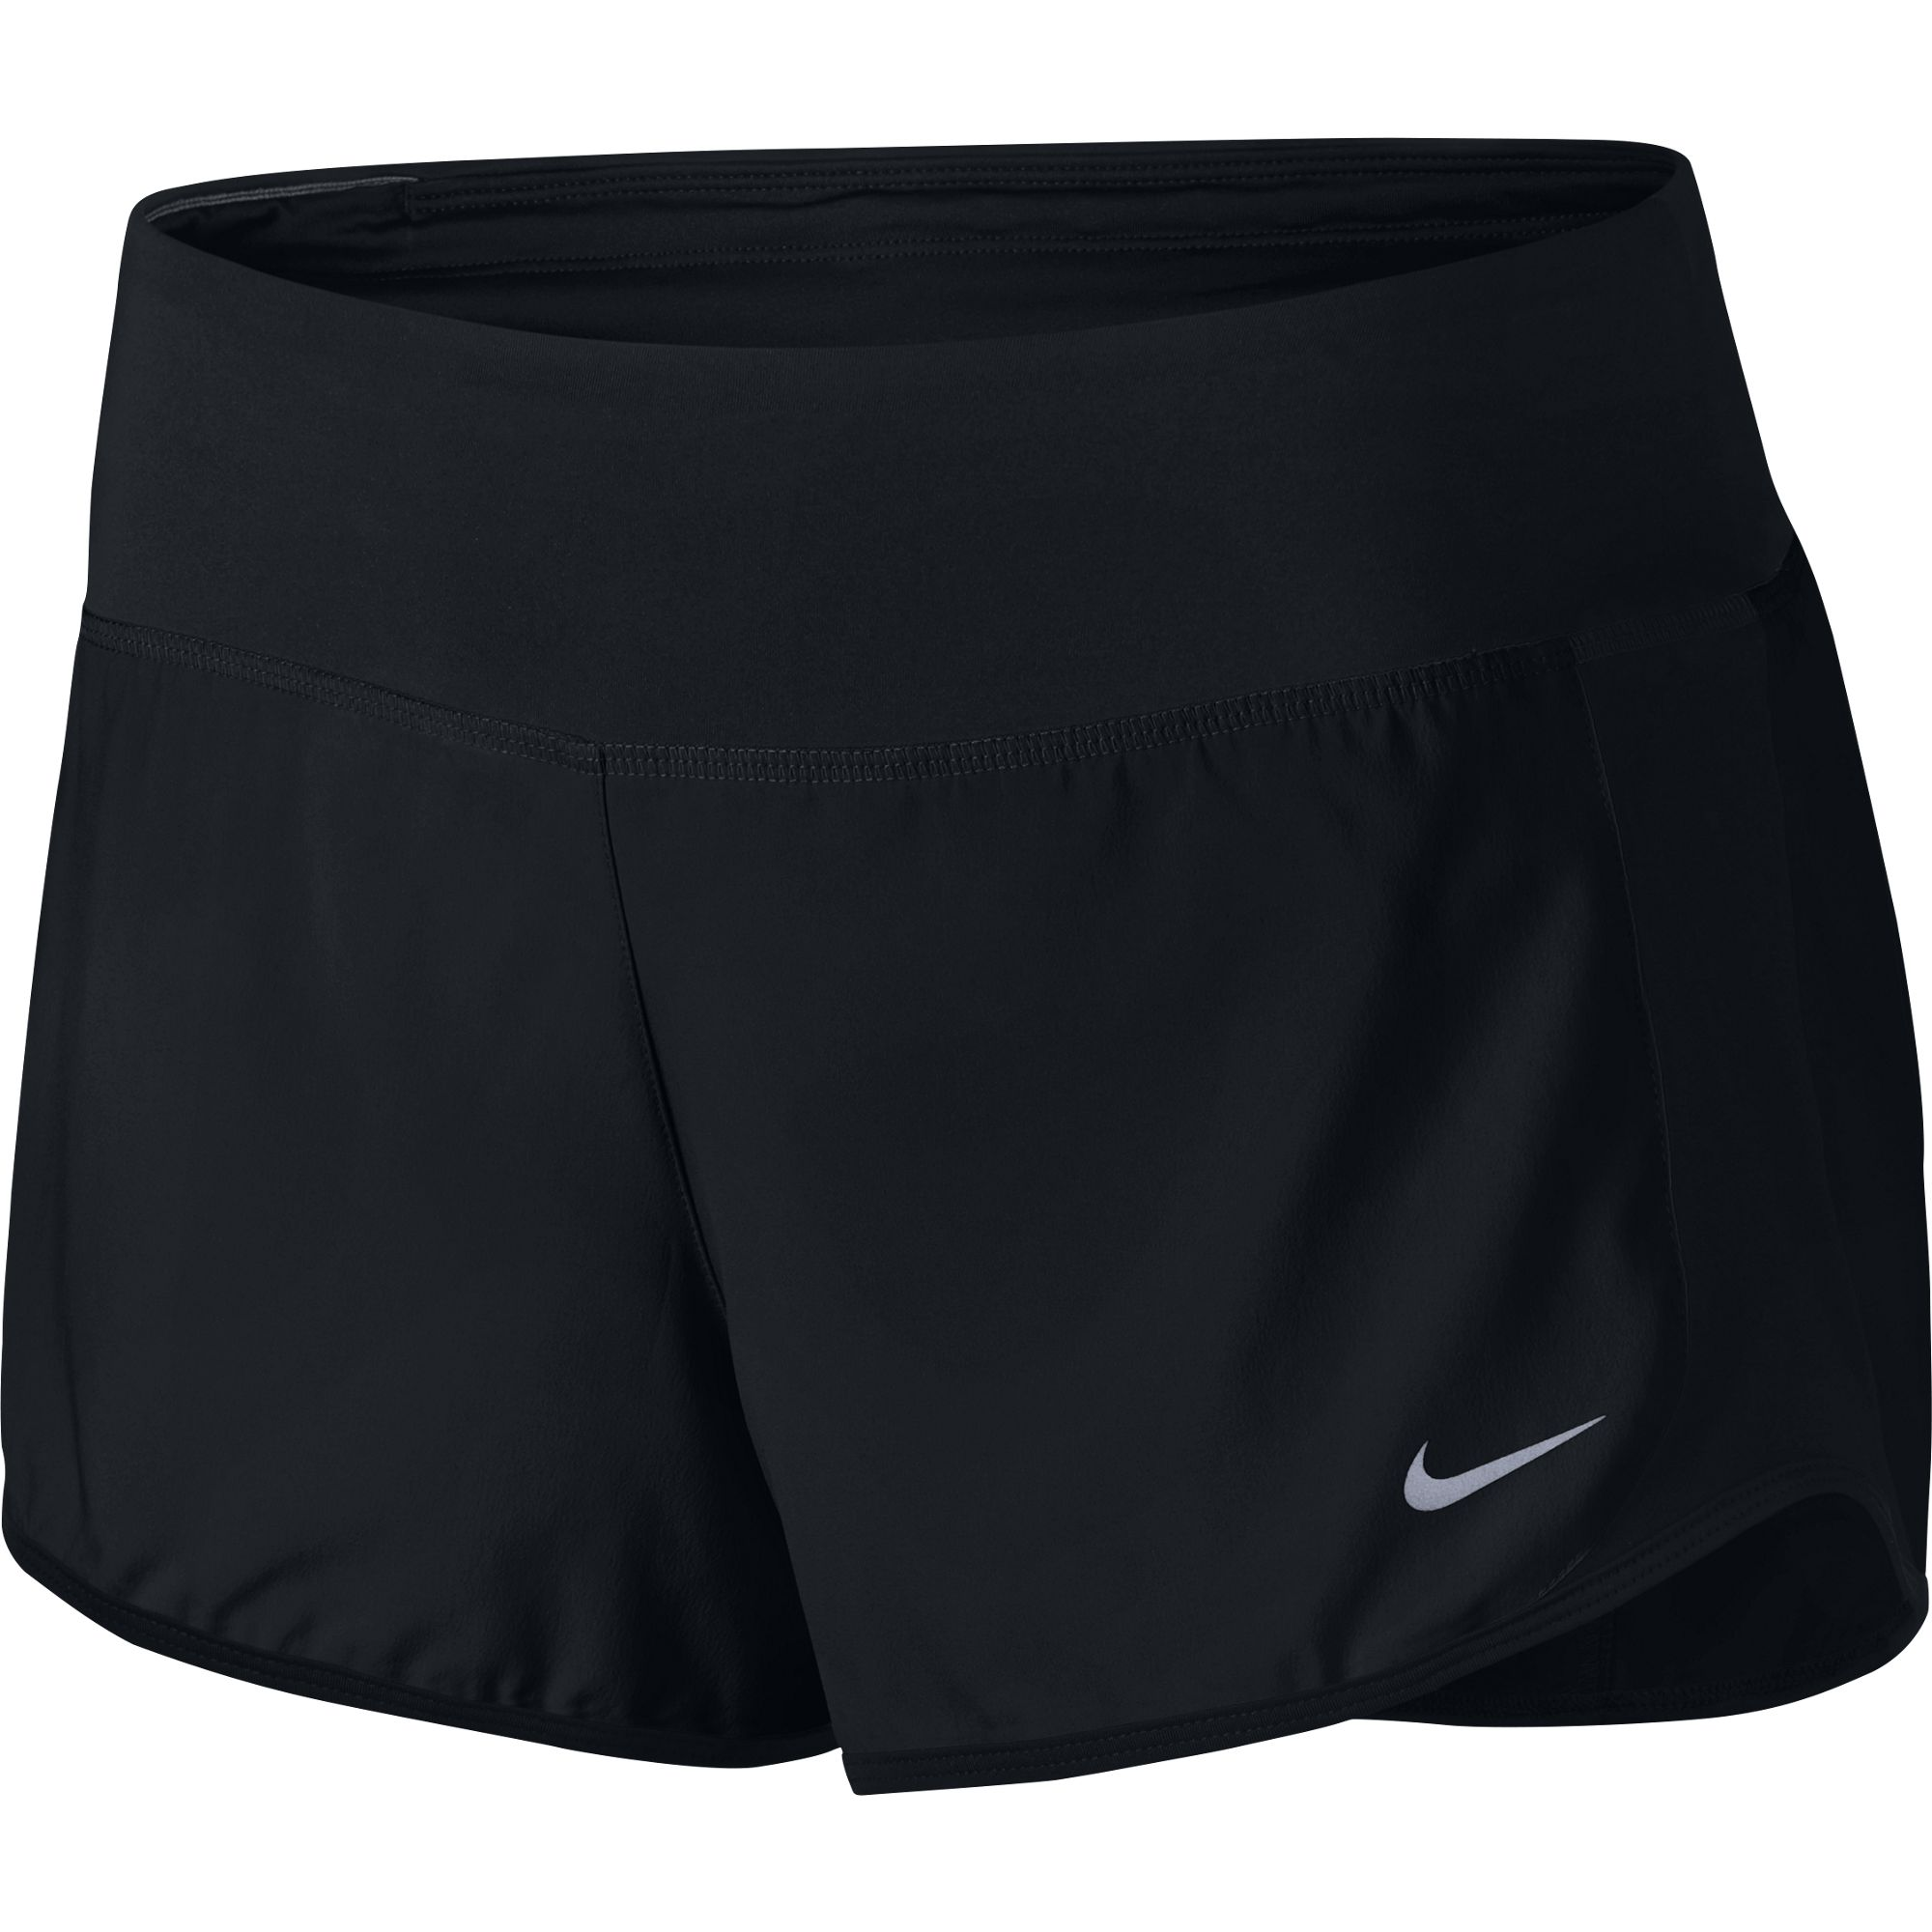 03f51dbf8a933 Nike Womens Running Clothes Sale - Joe Maloy